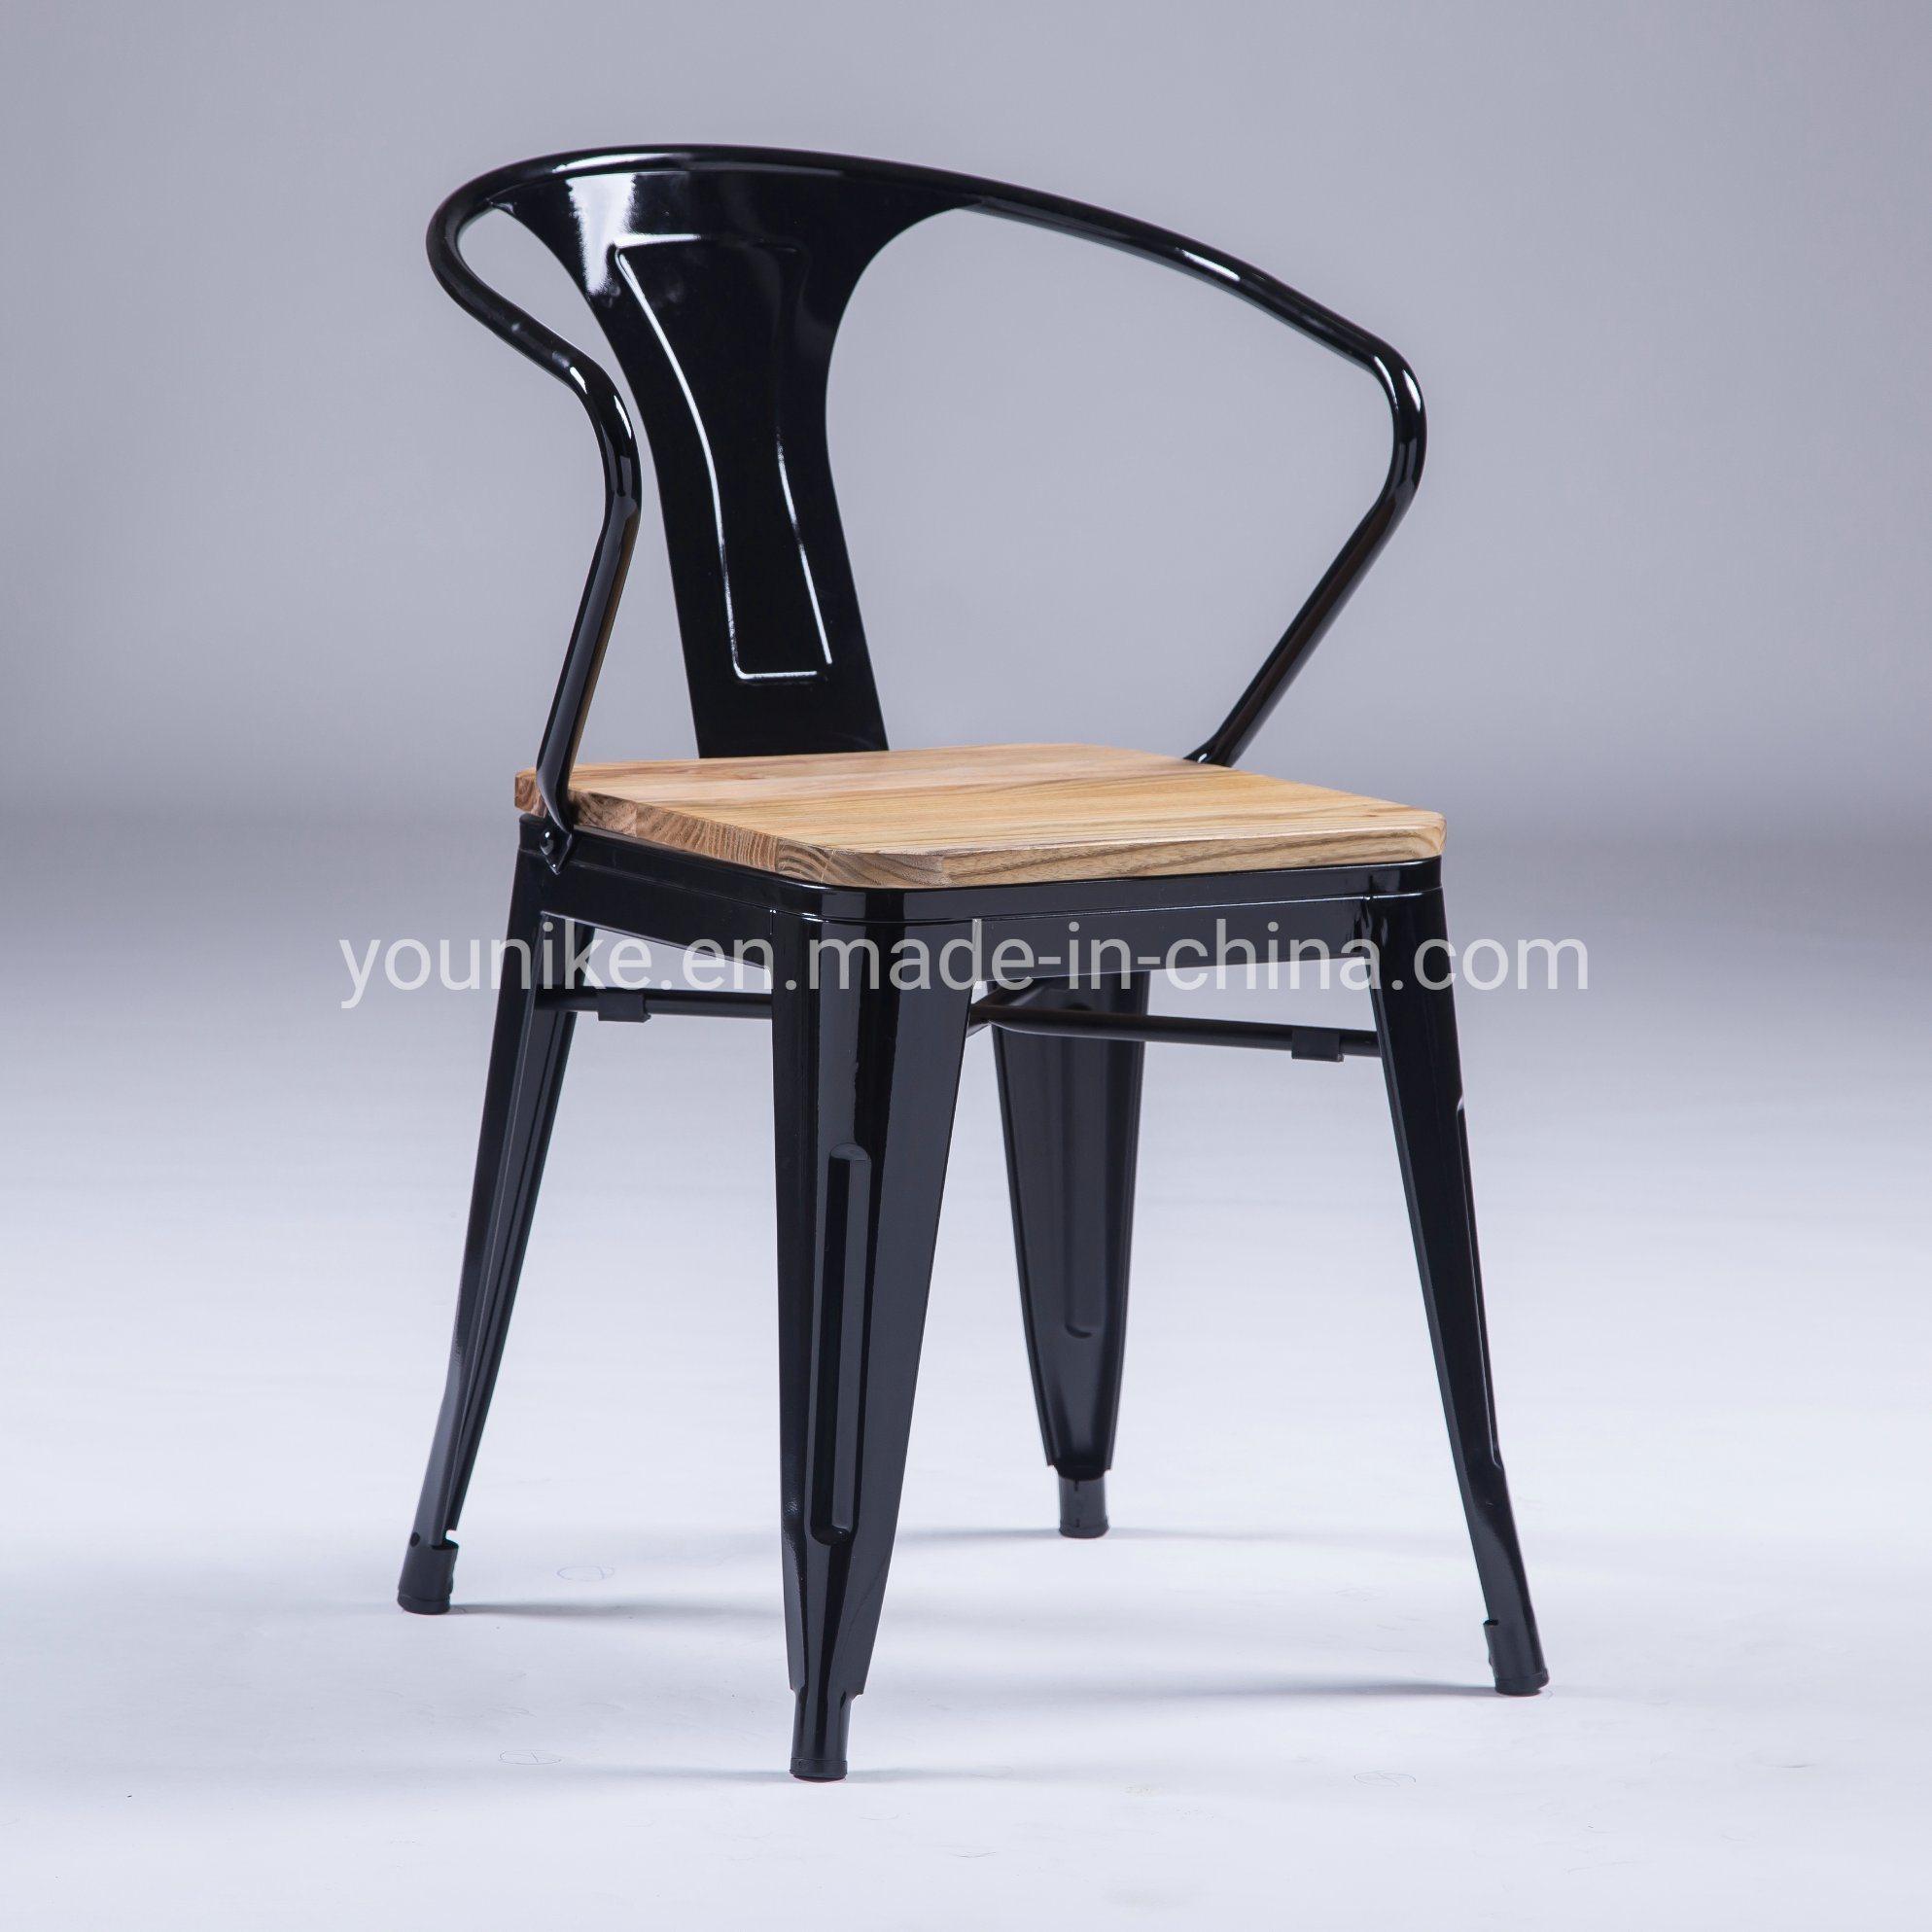 Super Hot Item Industrial Armchair Tolix Metal Dining Chair Wood Seat Polishing Black Machost Co Dining Chair Design Ideas Machostcouk